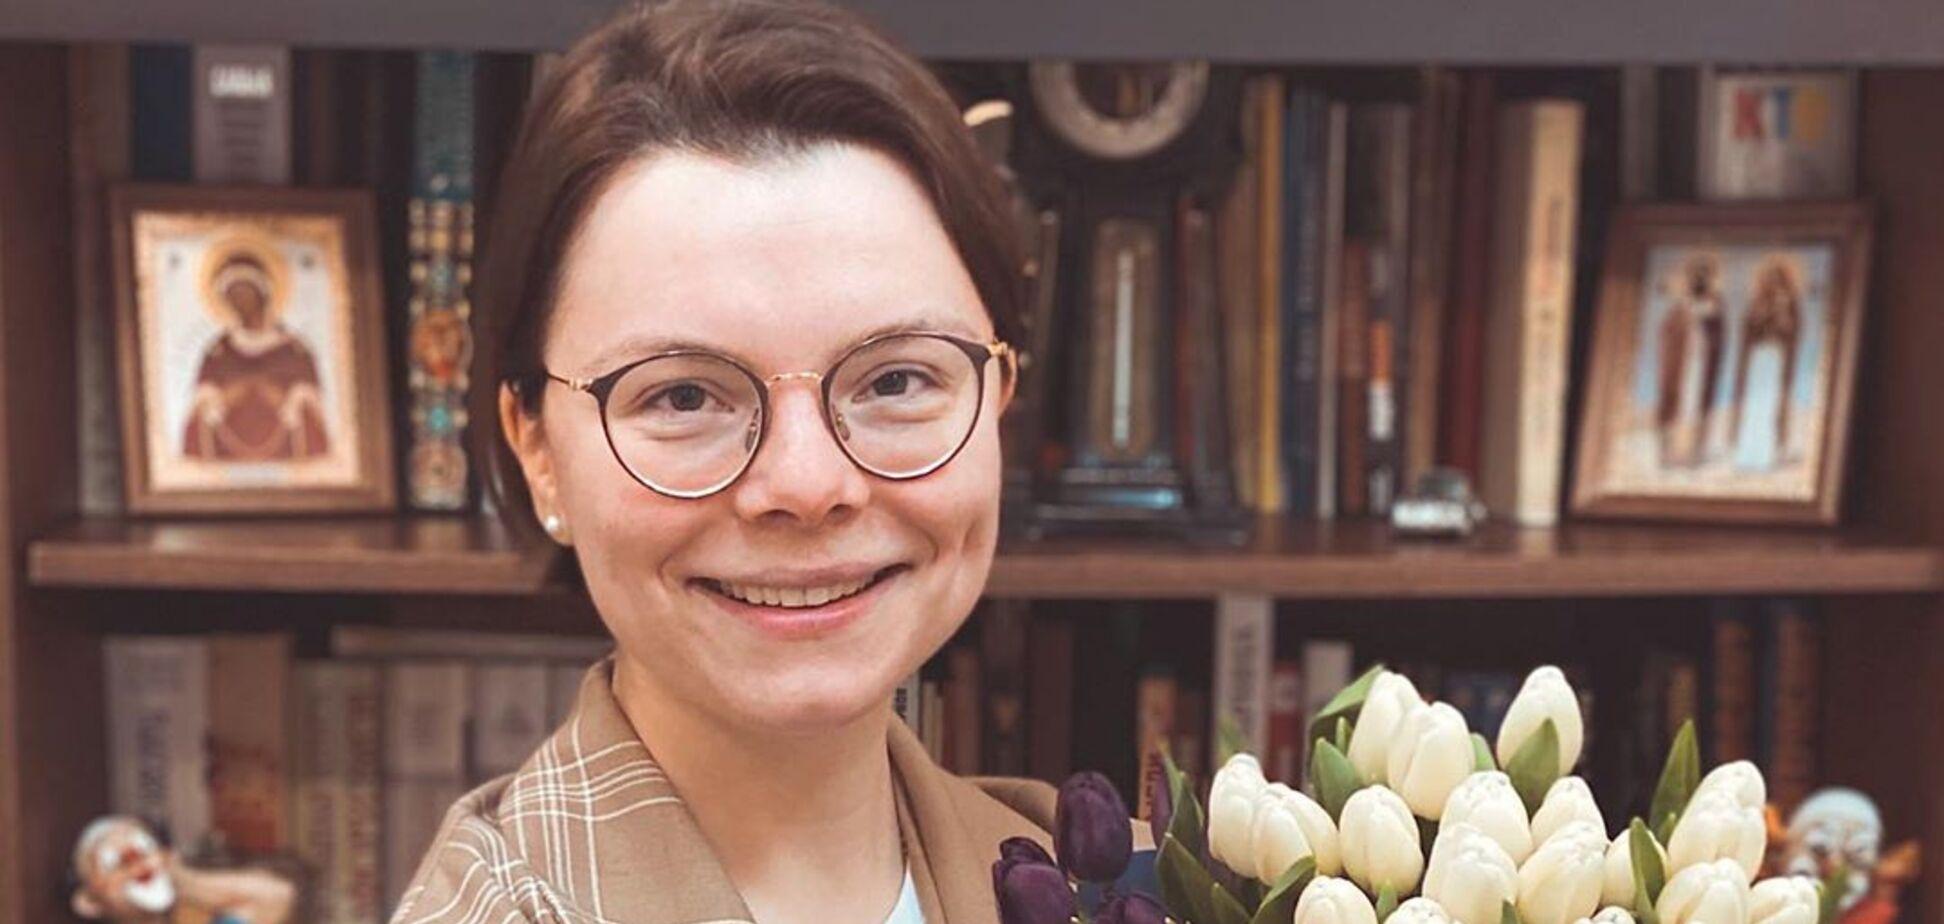 Жена Петросяна Брухунова осадила поклонников в сети из-за советов